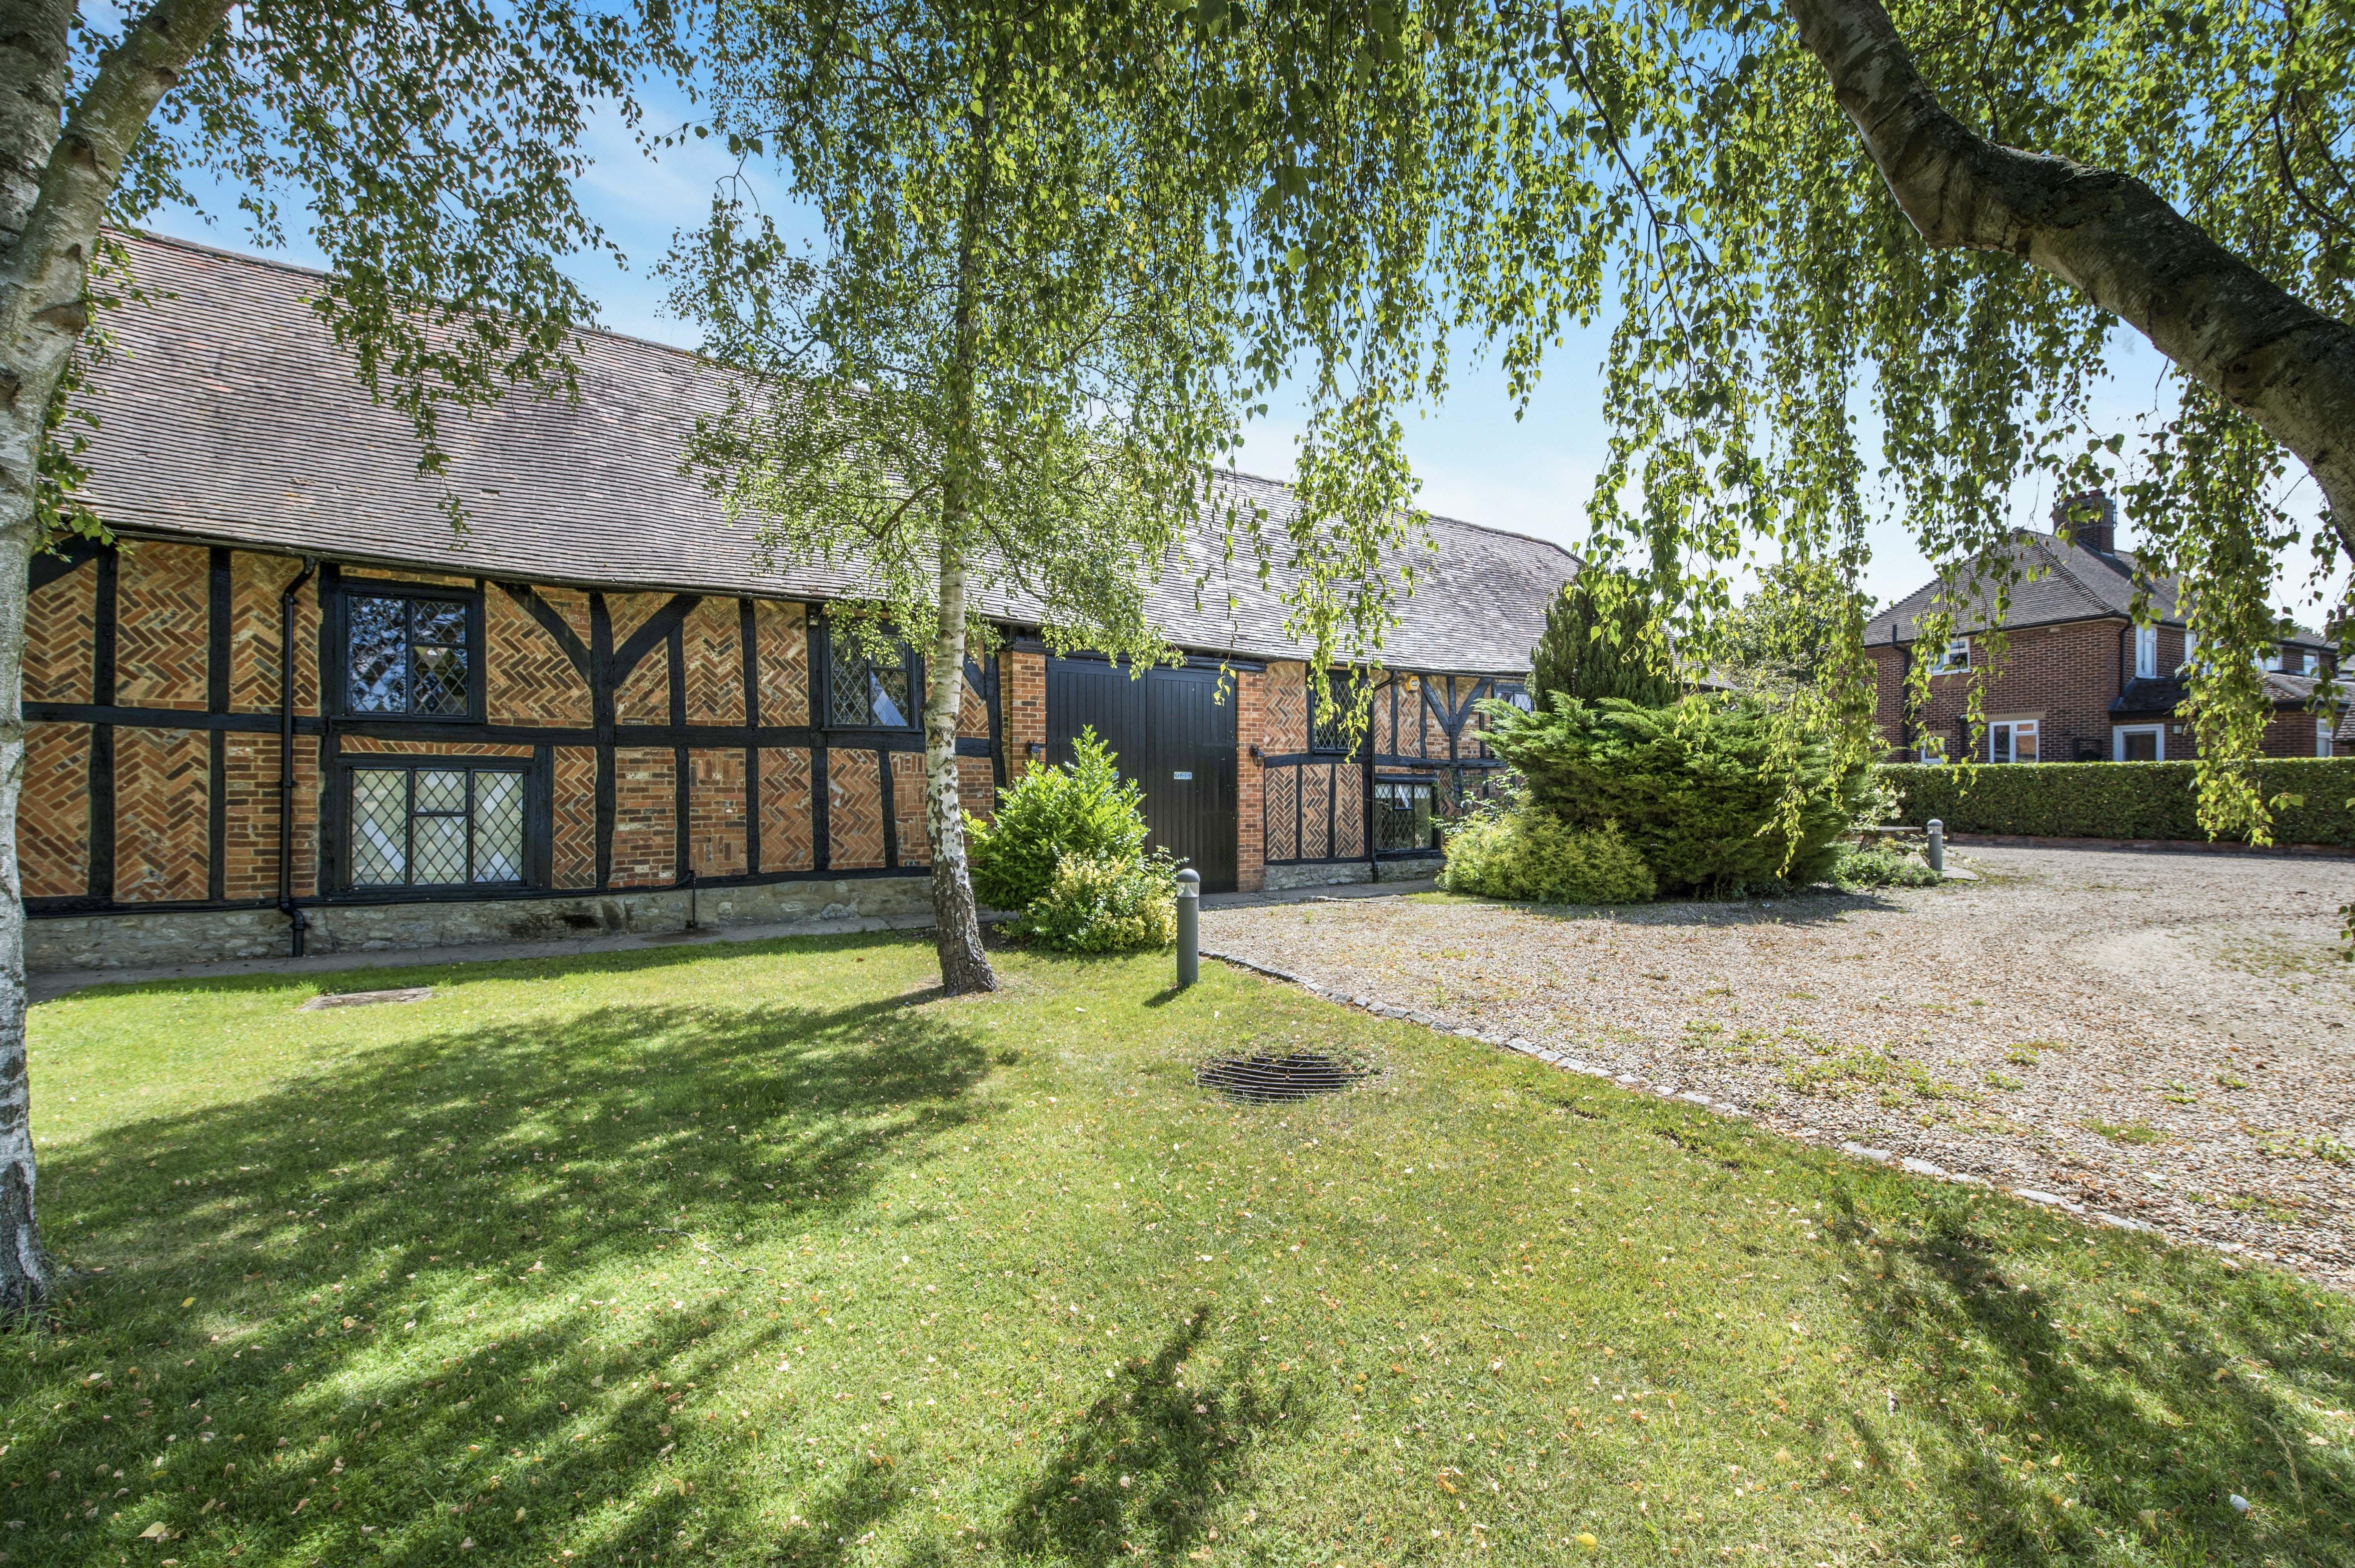 Tithe Barn Church Road, Thame, Office / Residential / Investment To Let - EXTERNAL : GARDEN.jpg